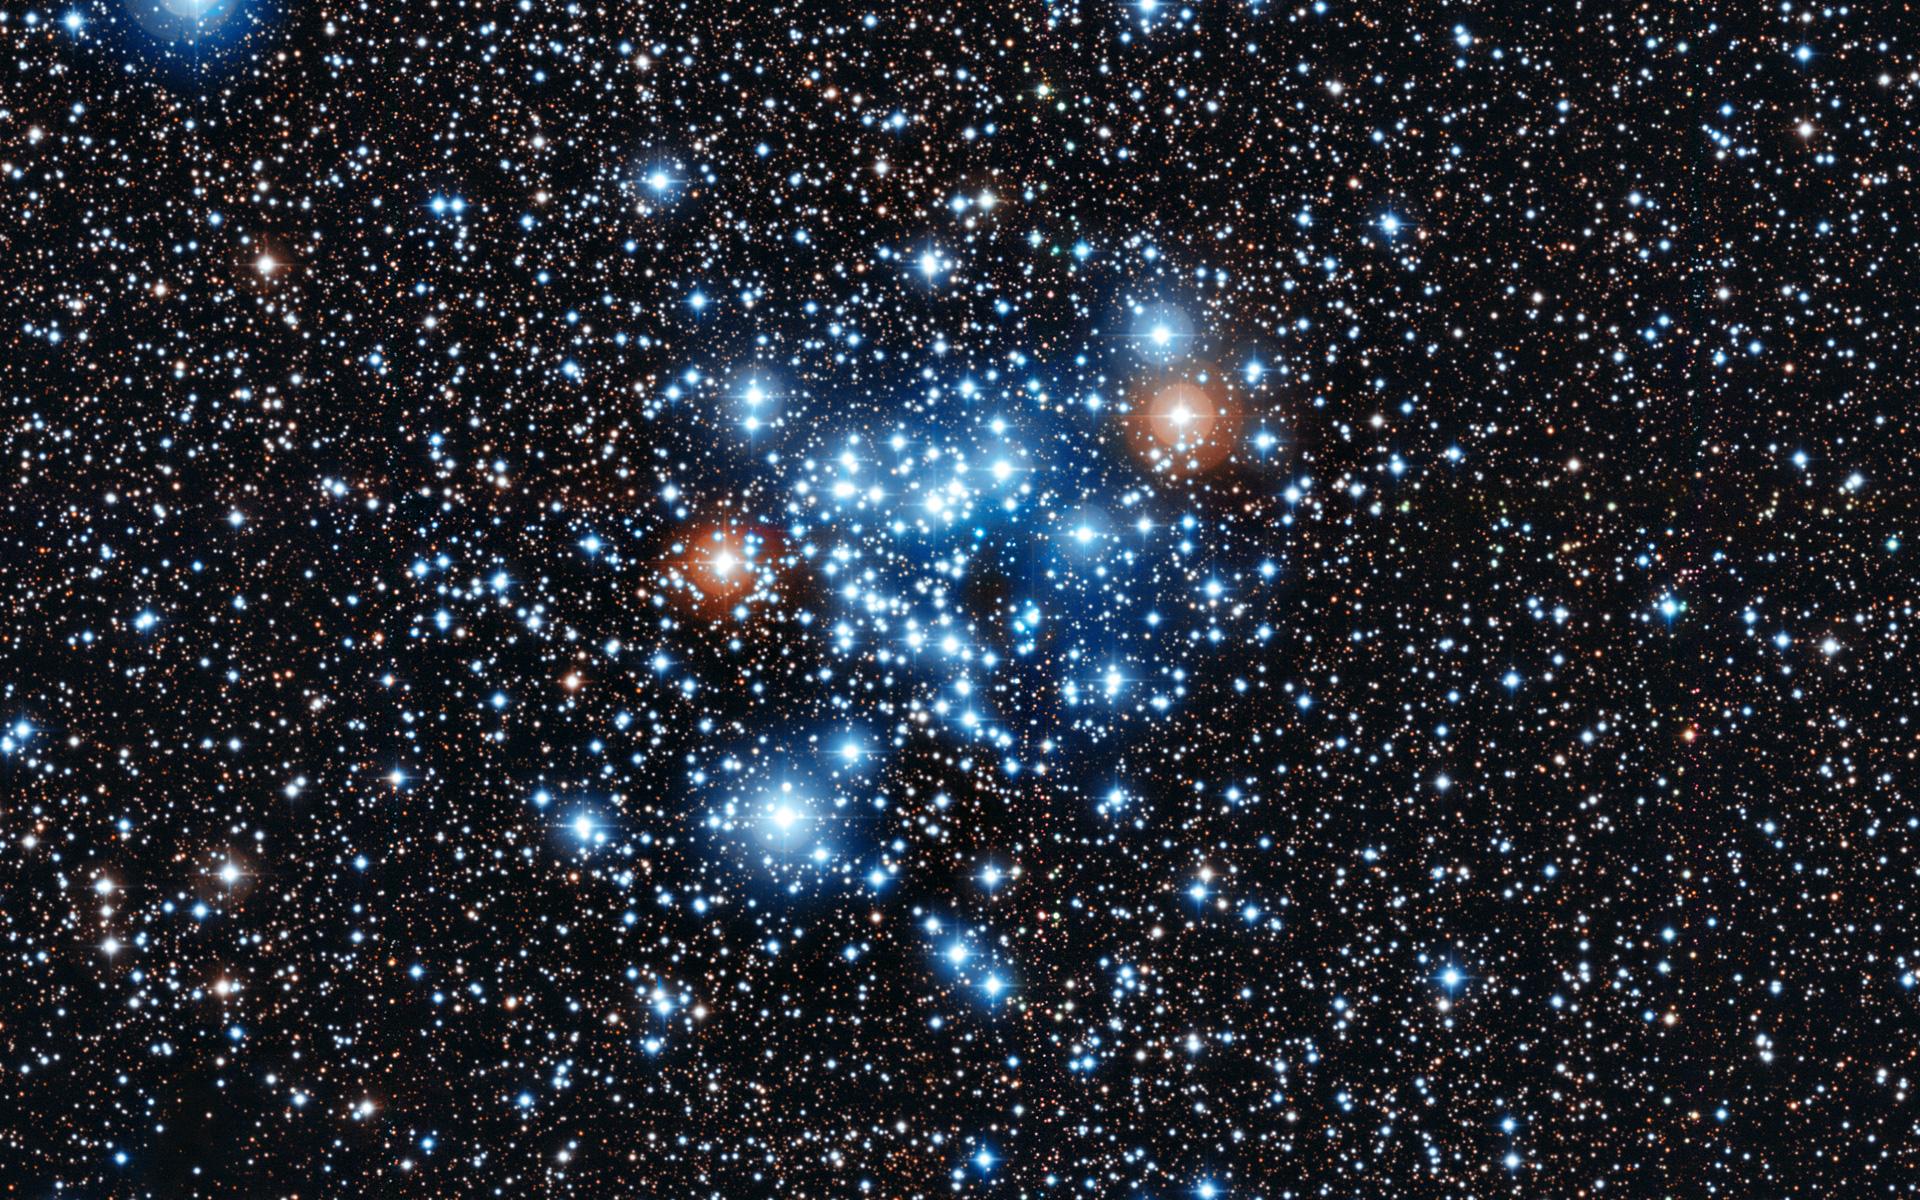 starcluster wallpaper - photo #17